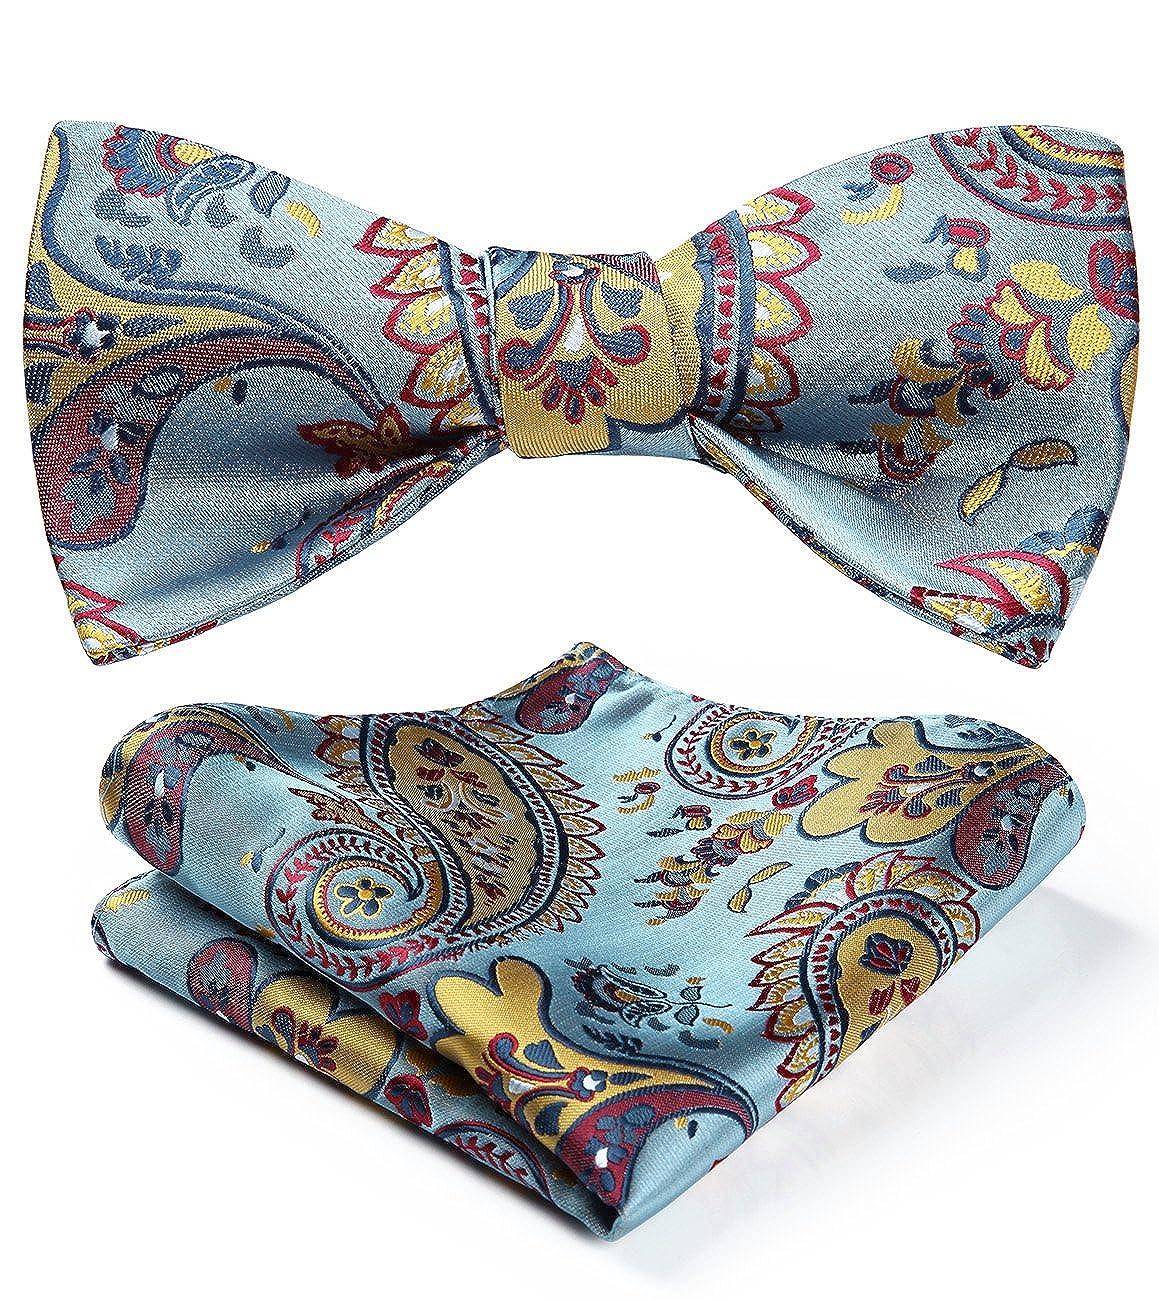 HISDERN Men's Paisley Floral Wedding Party Self Bow Tie Pocket Square Set BFS003QS-6